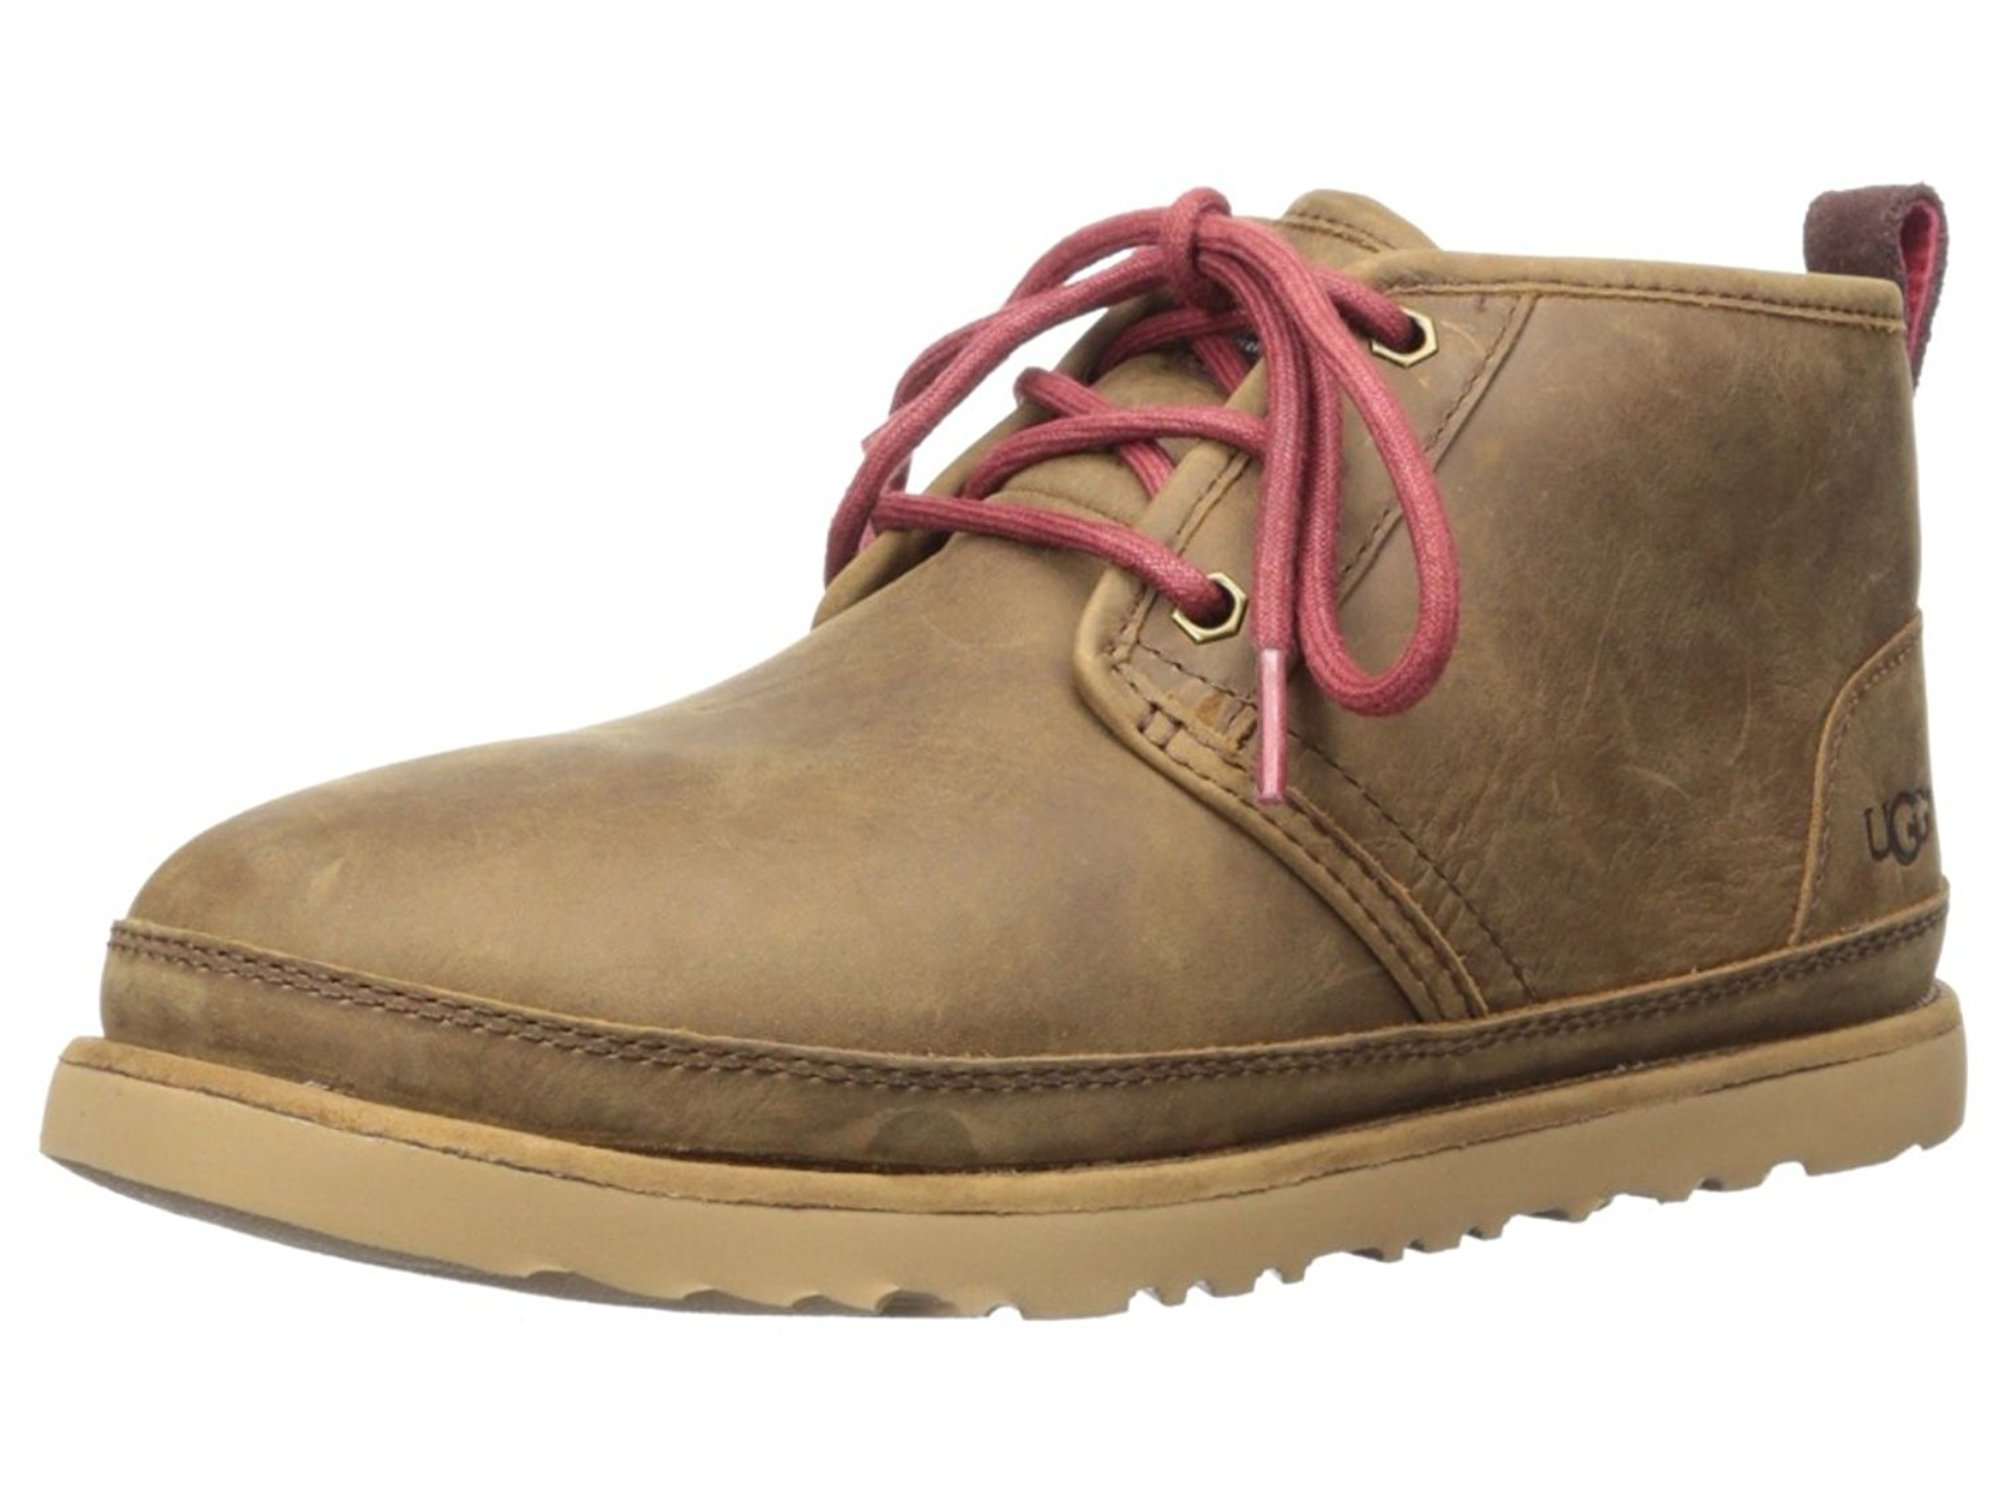 Ugg Men's Neumel Waterproof Chukka Boot